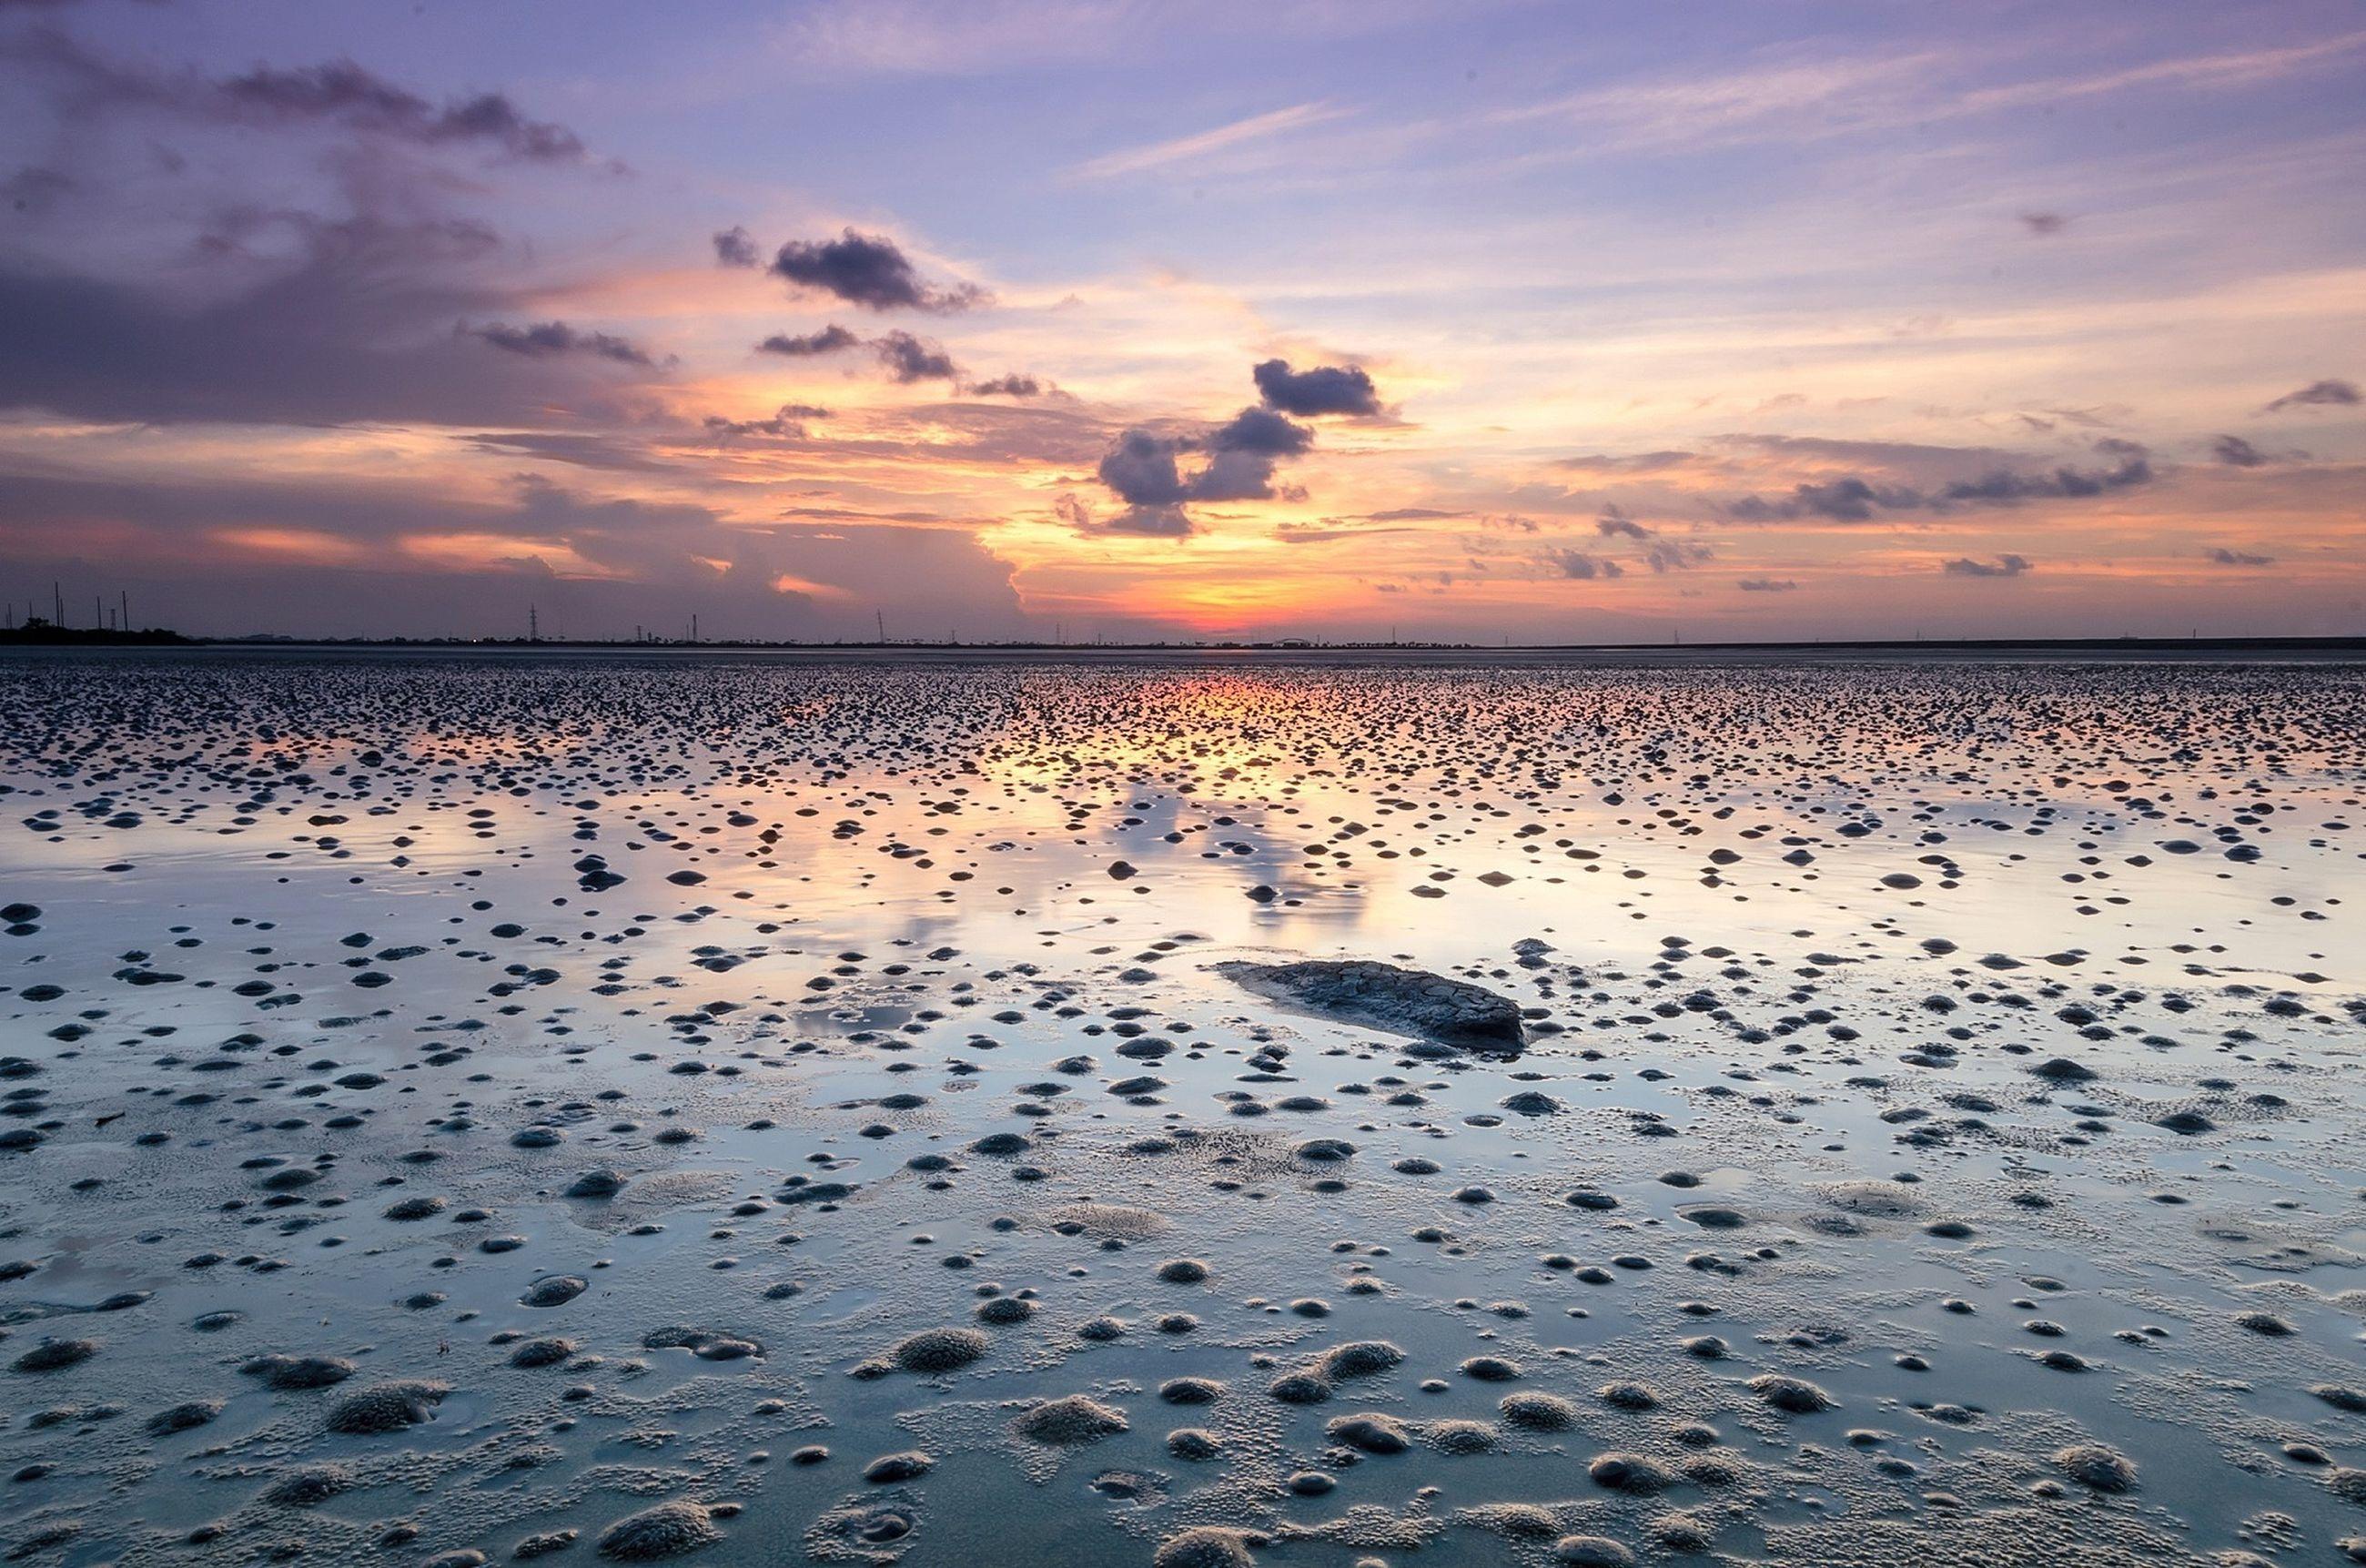 water, sunset, sea, bird, sky, animal themes, horizon over water, animals in the wild, tranquil scene, scenics, wildlife, beauty in nature, beach, tranquility, cloud - sky, nature, flock of birds, idyllic, shore